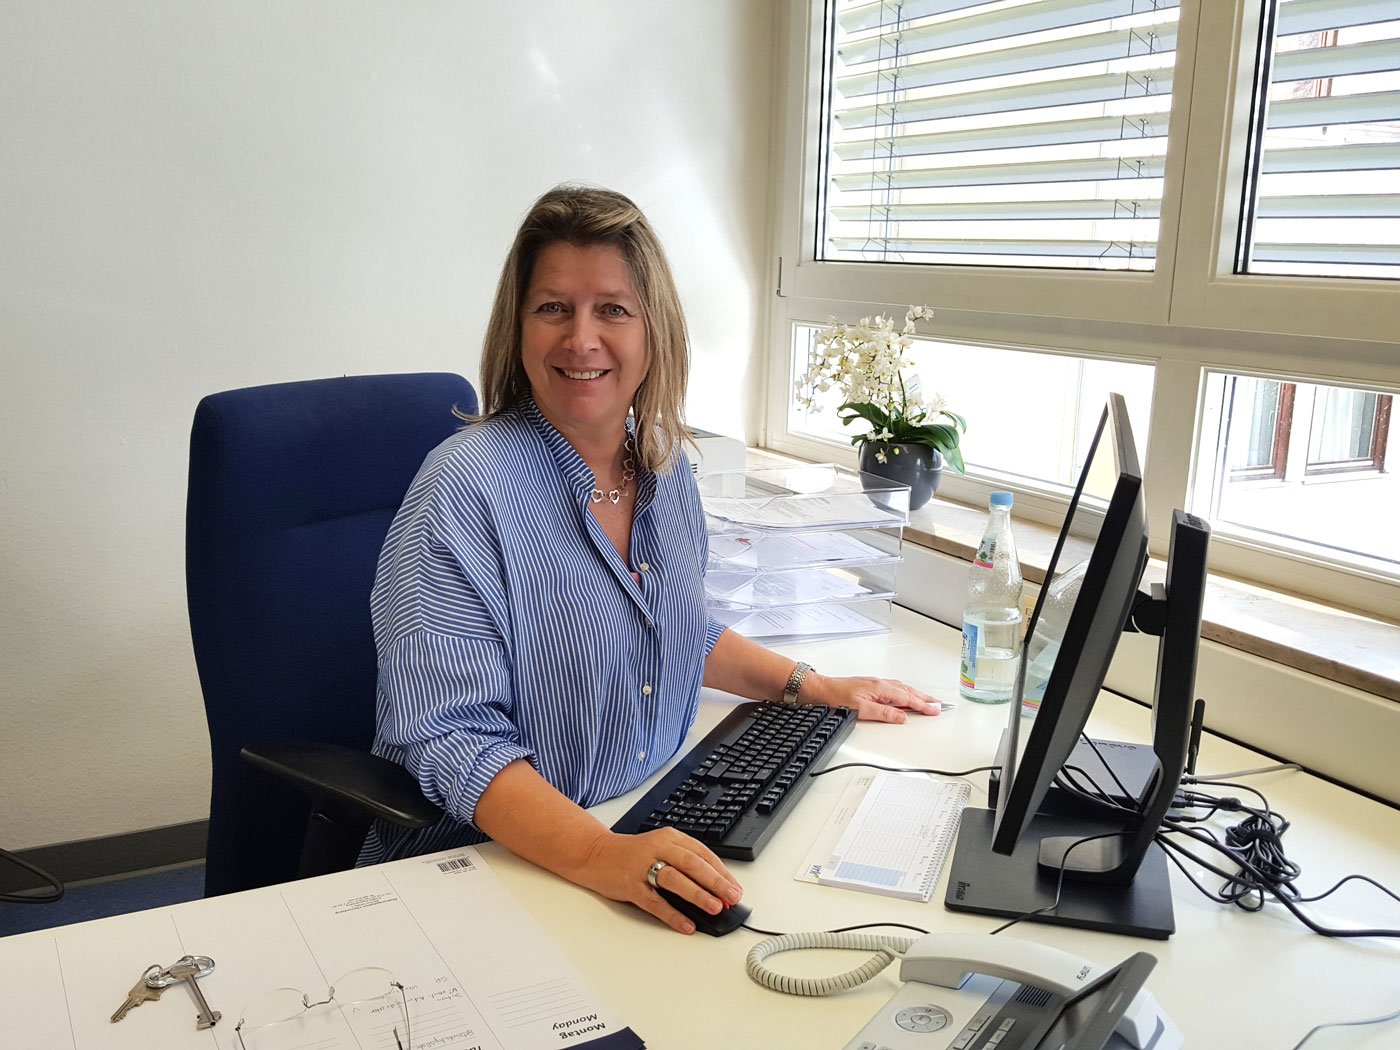 Frau Schaffert-Renz in ihrem Büro